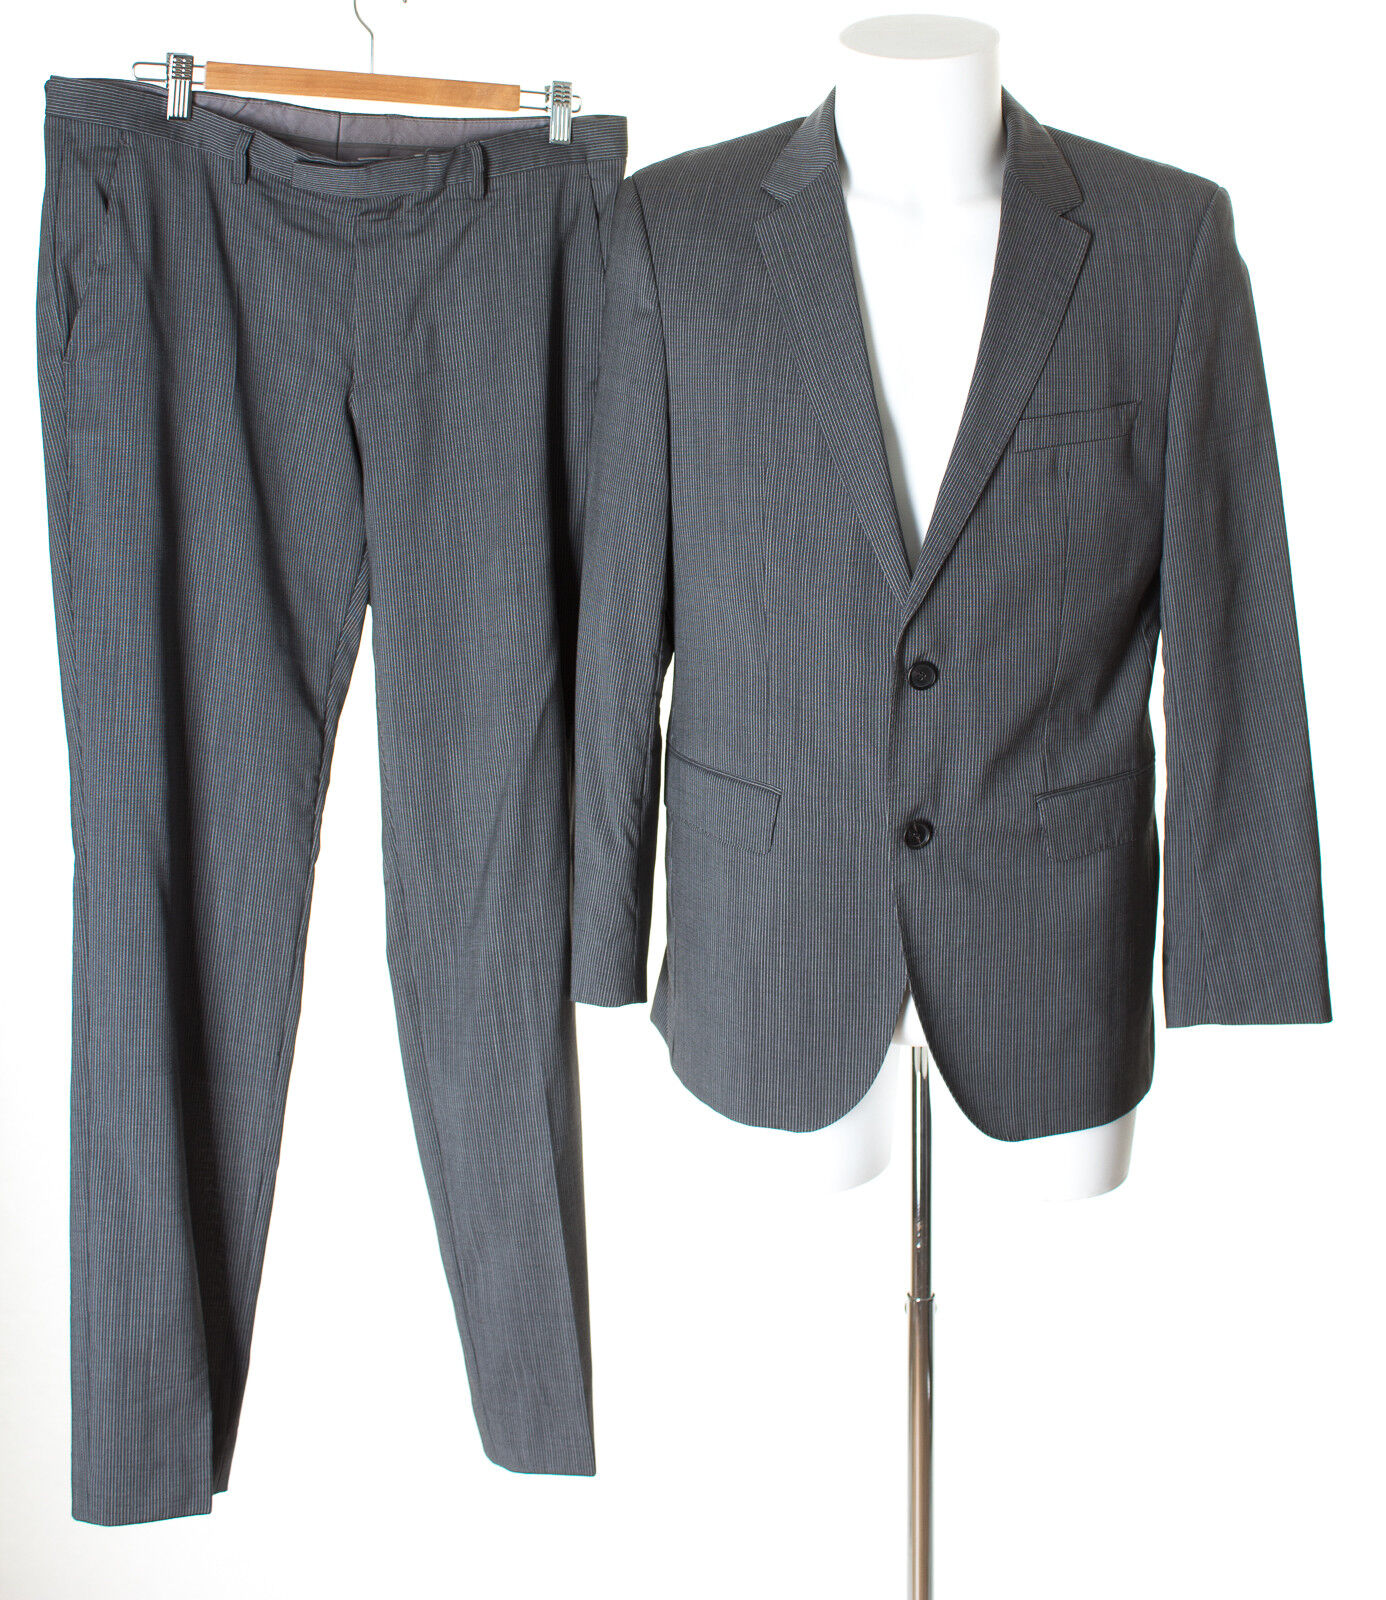 HUGO BOSS Herren Anzug Super 100´S Gr. 50 The James4/Sharp6